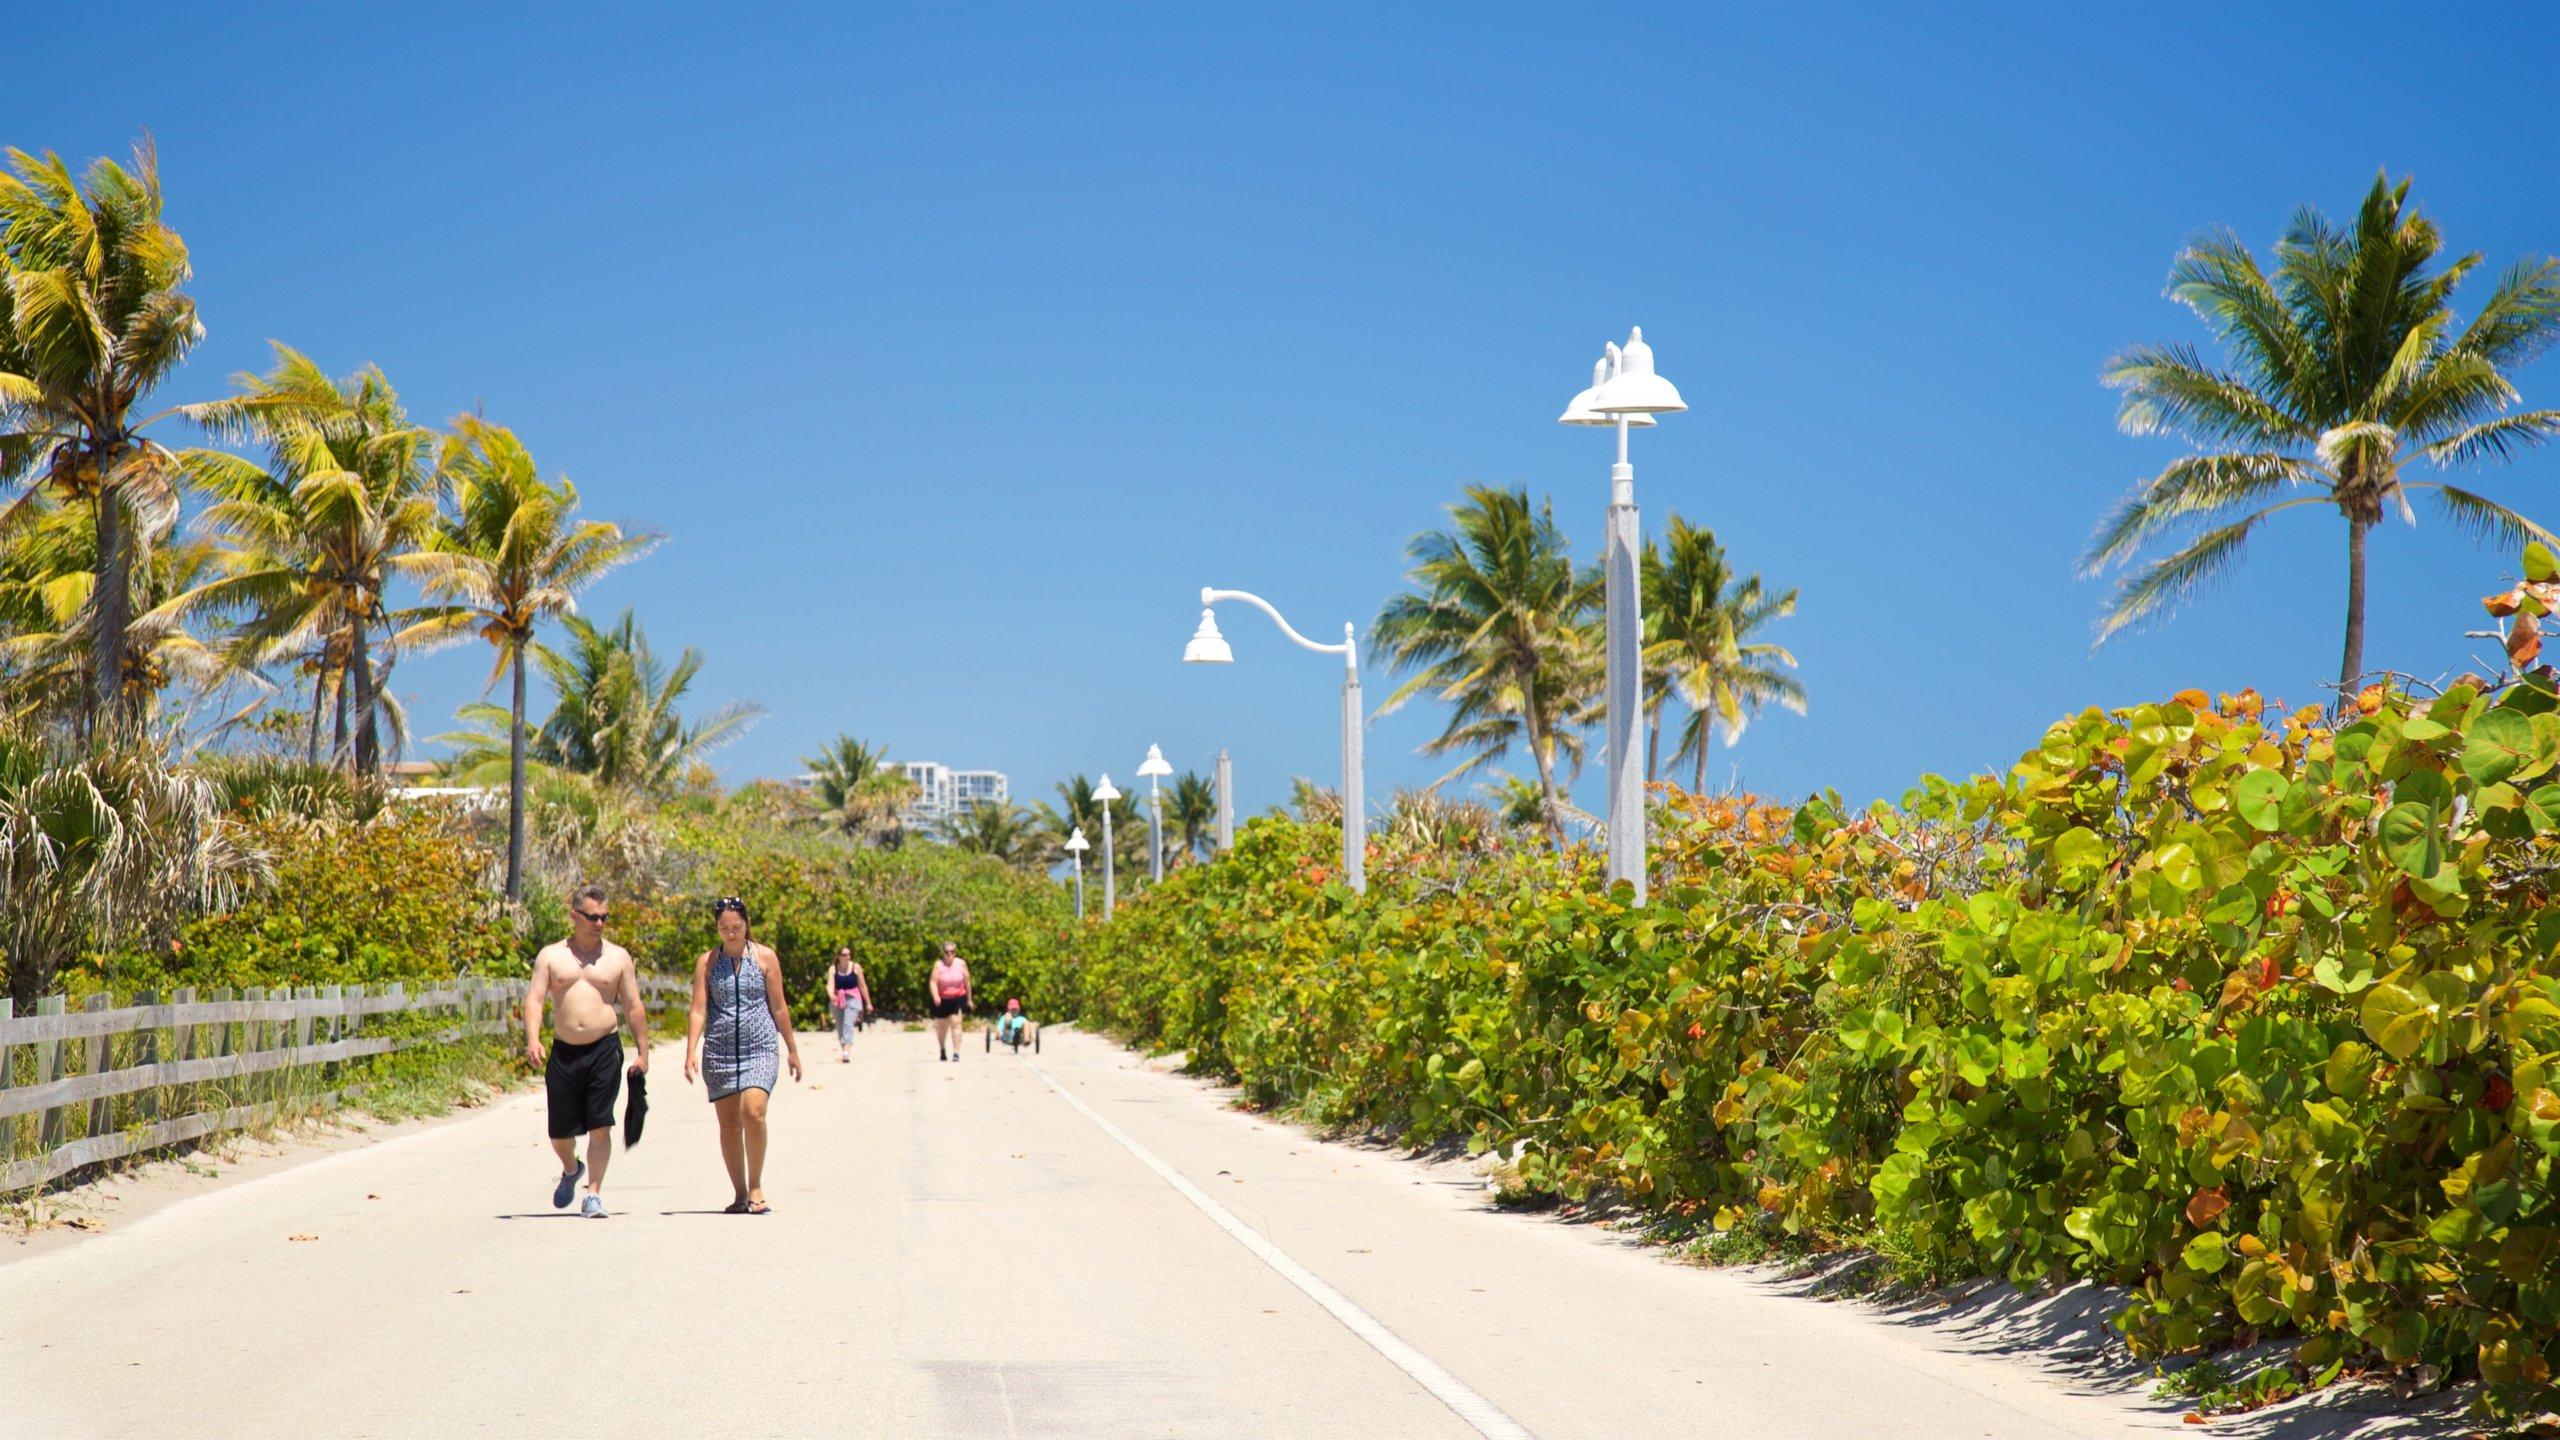 Hollywood Beach, Hollywood, Broward County, Florida, United States of America